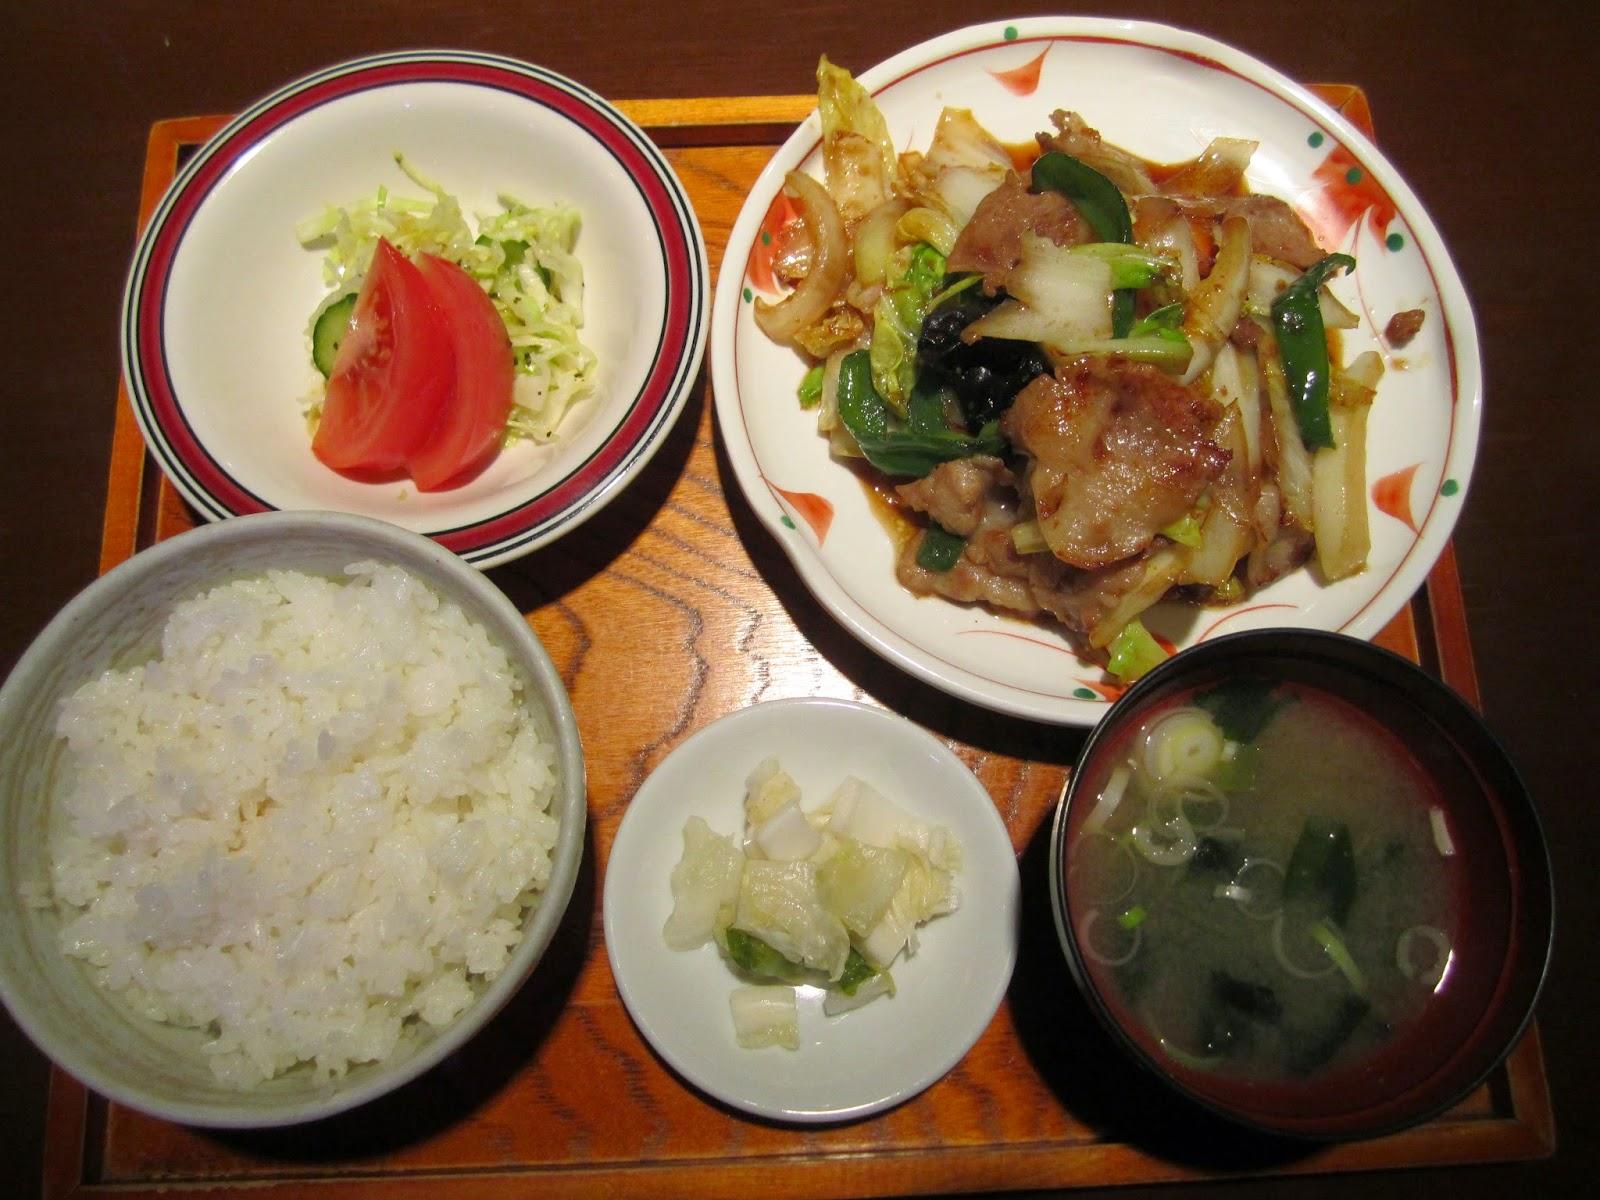 Yasai Itame Fu Yakiniku Pork Set Isshin 野菜炒め風焼肉ポークセット イッシン